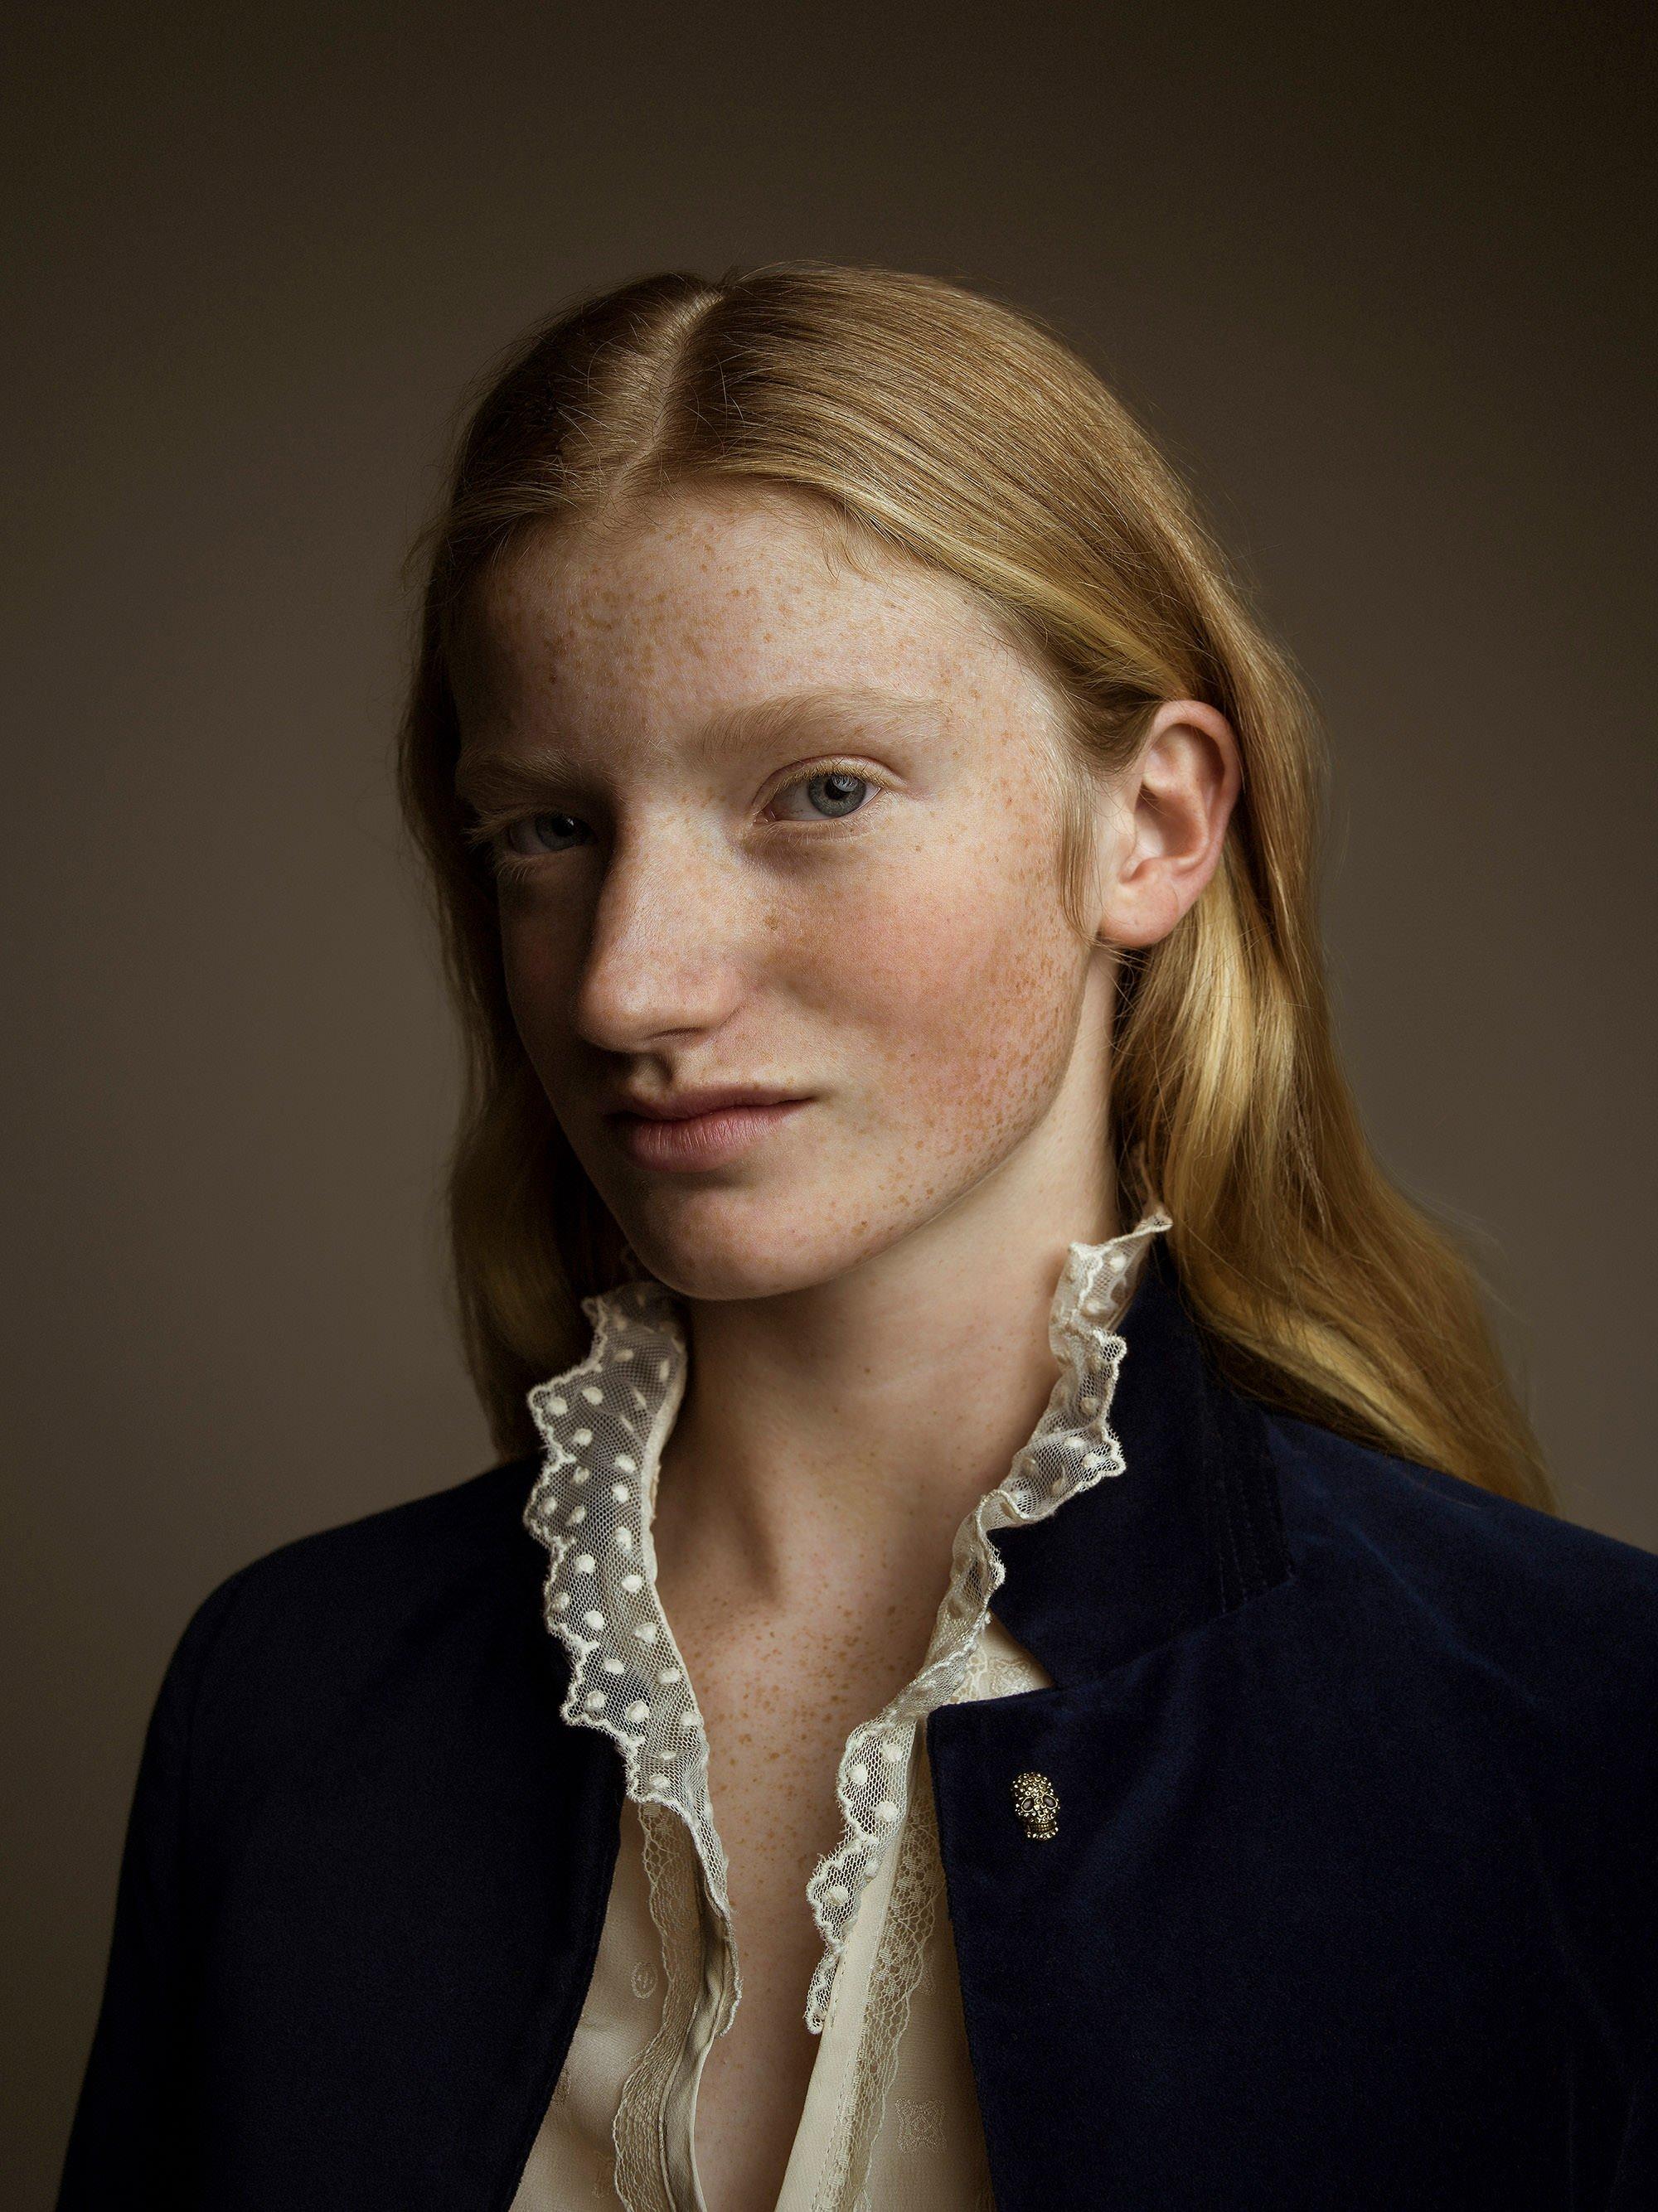 Photographie de portrait par Maarten Schröder